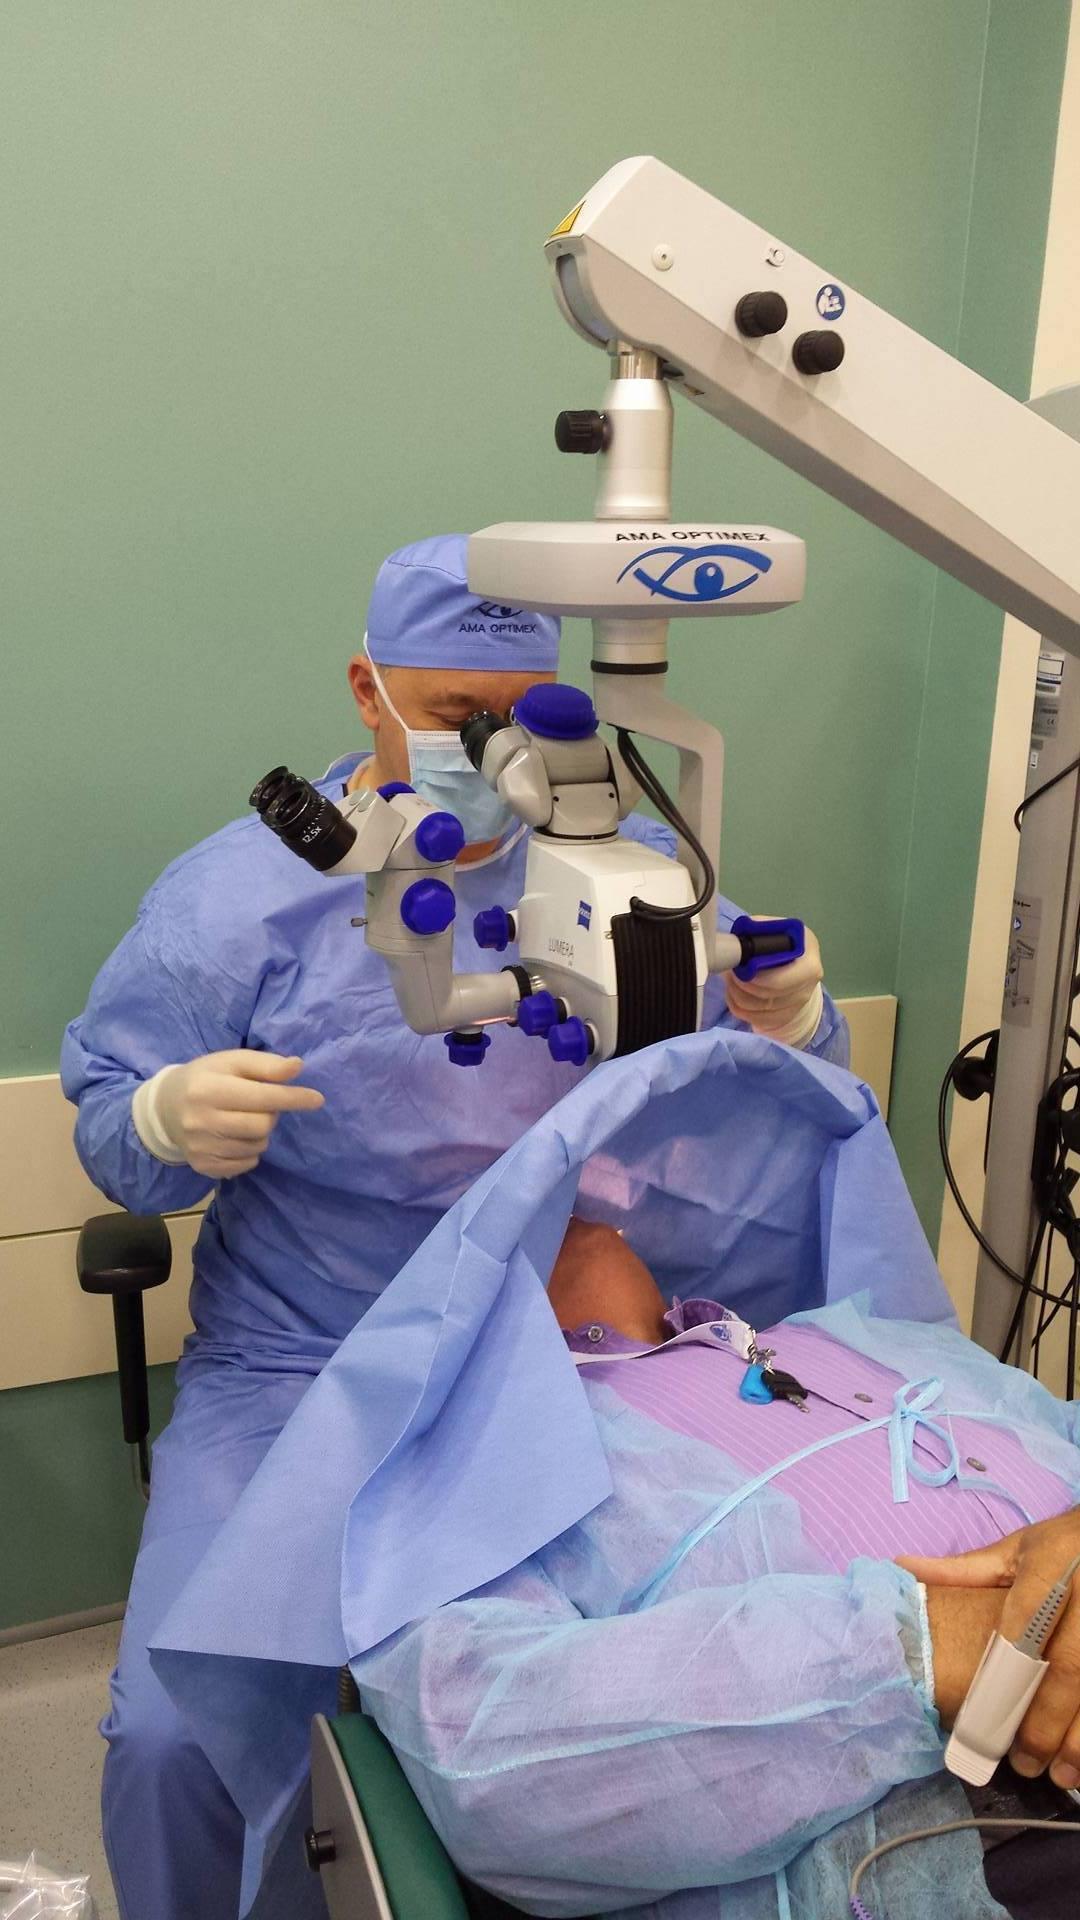 chirurgie cu laser pentru restabilirea vederii